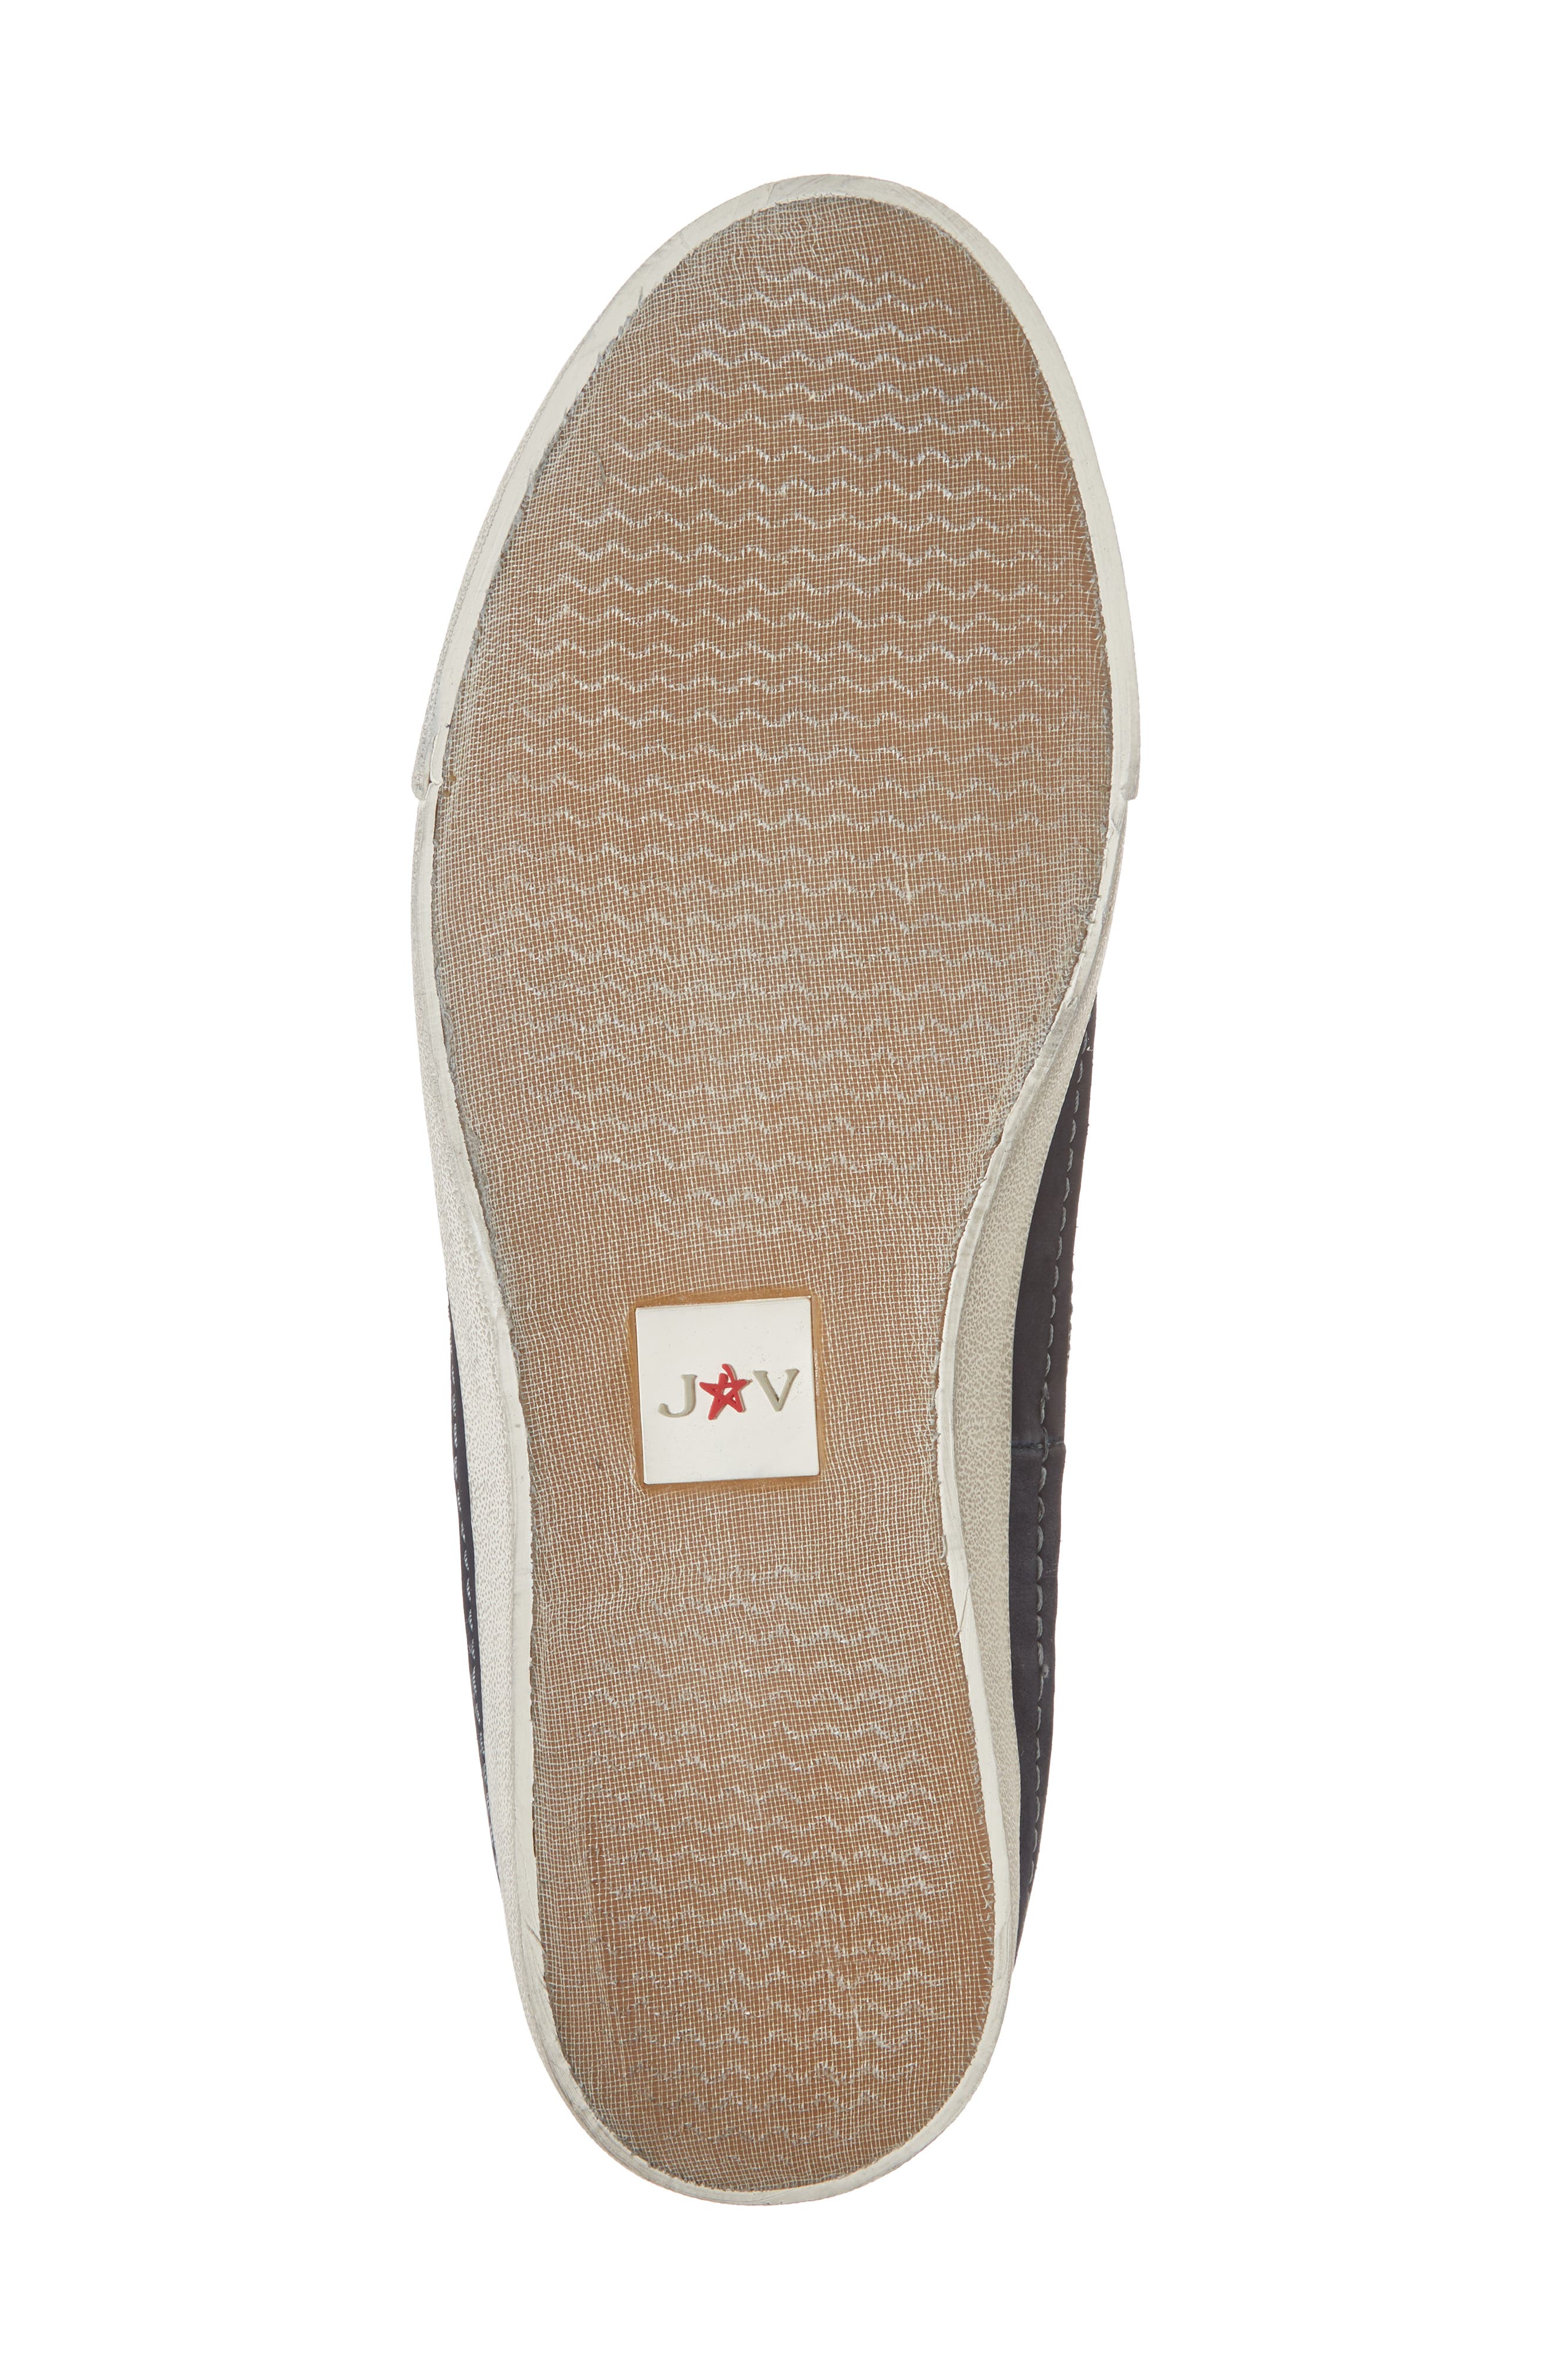 JOHN VARVATOS STAR USA, Jett Slip-On Sneaker, Alternate thumbnail 6, color, MIDNIGHT